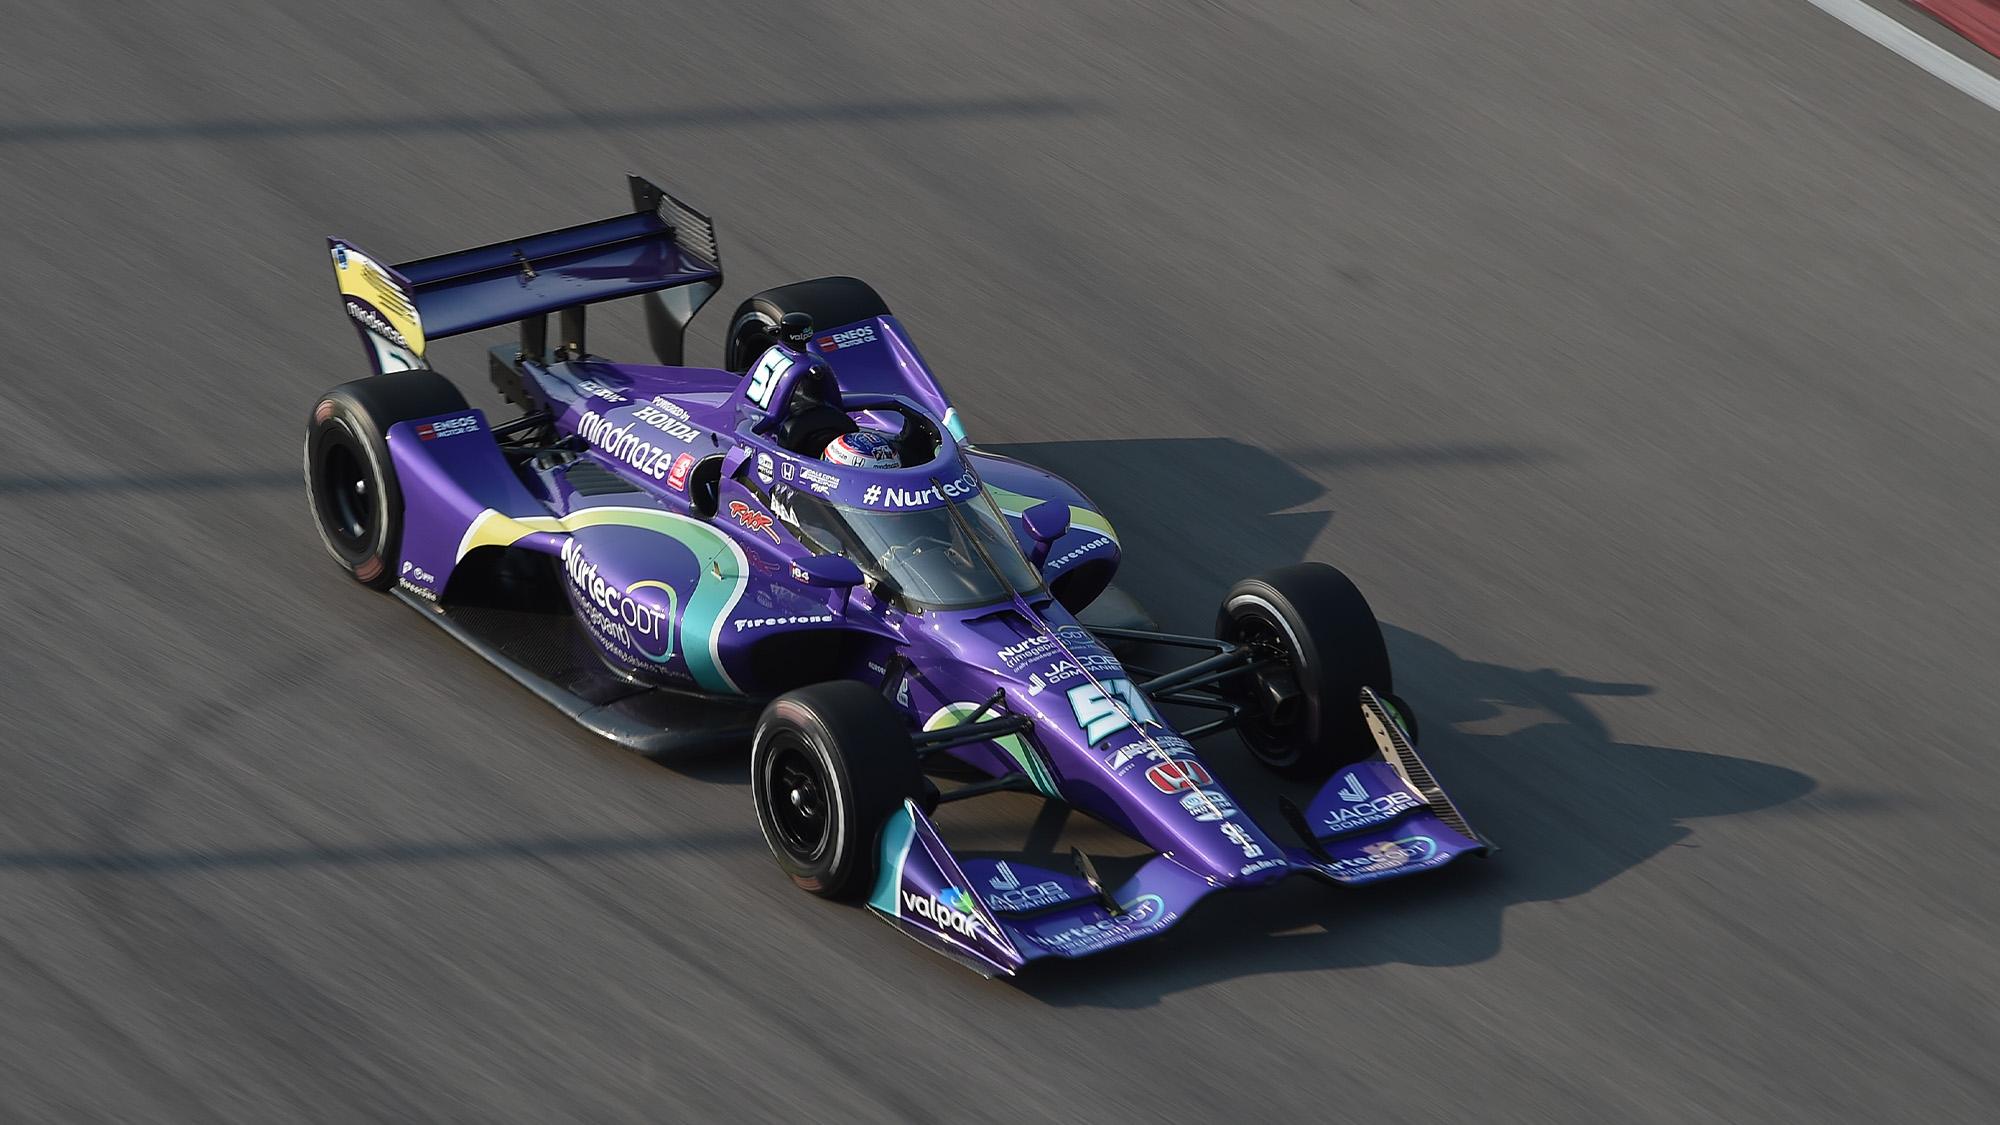 Romain Grosjean on track at the 2021 IndyCar Gateway oval test